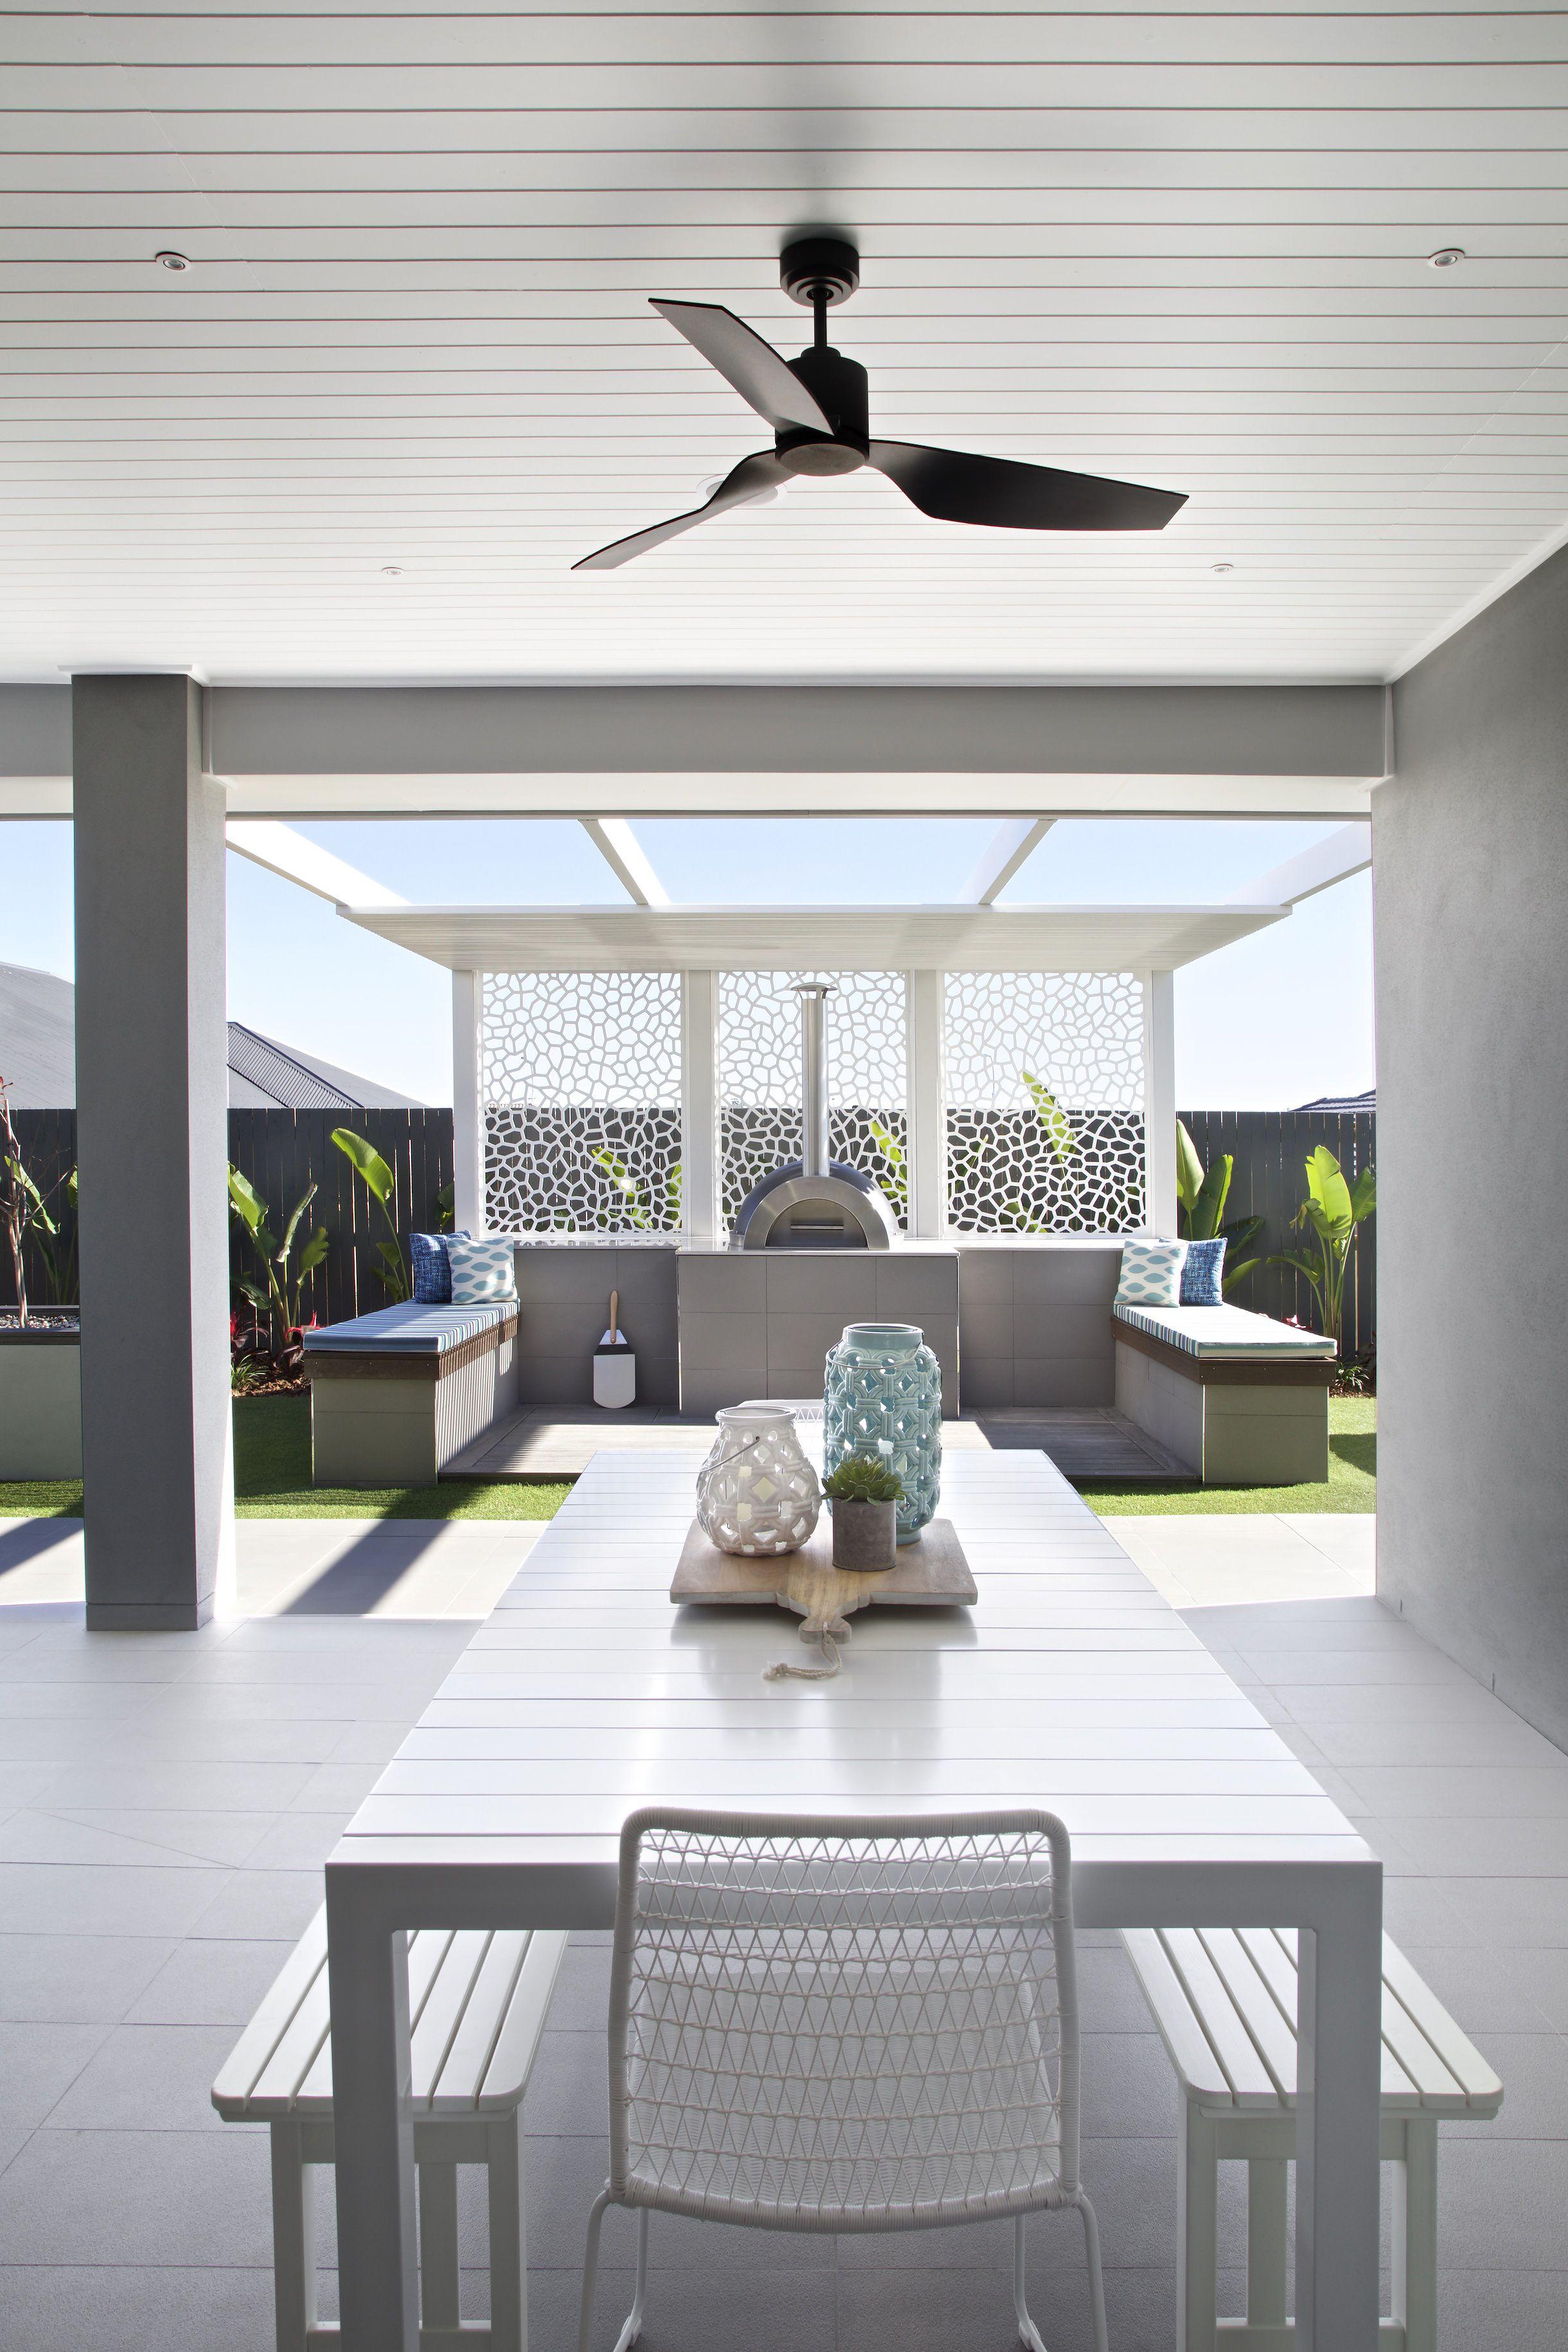 Newhaven 27 | Coastal, Outdoor living and Backyard